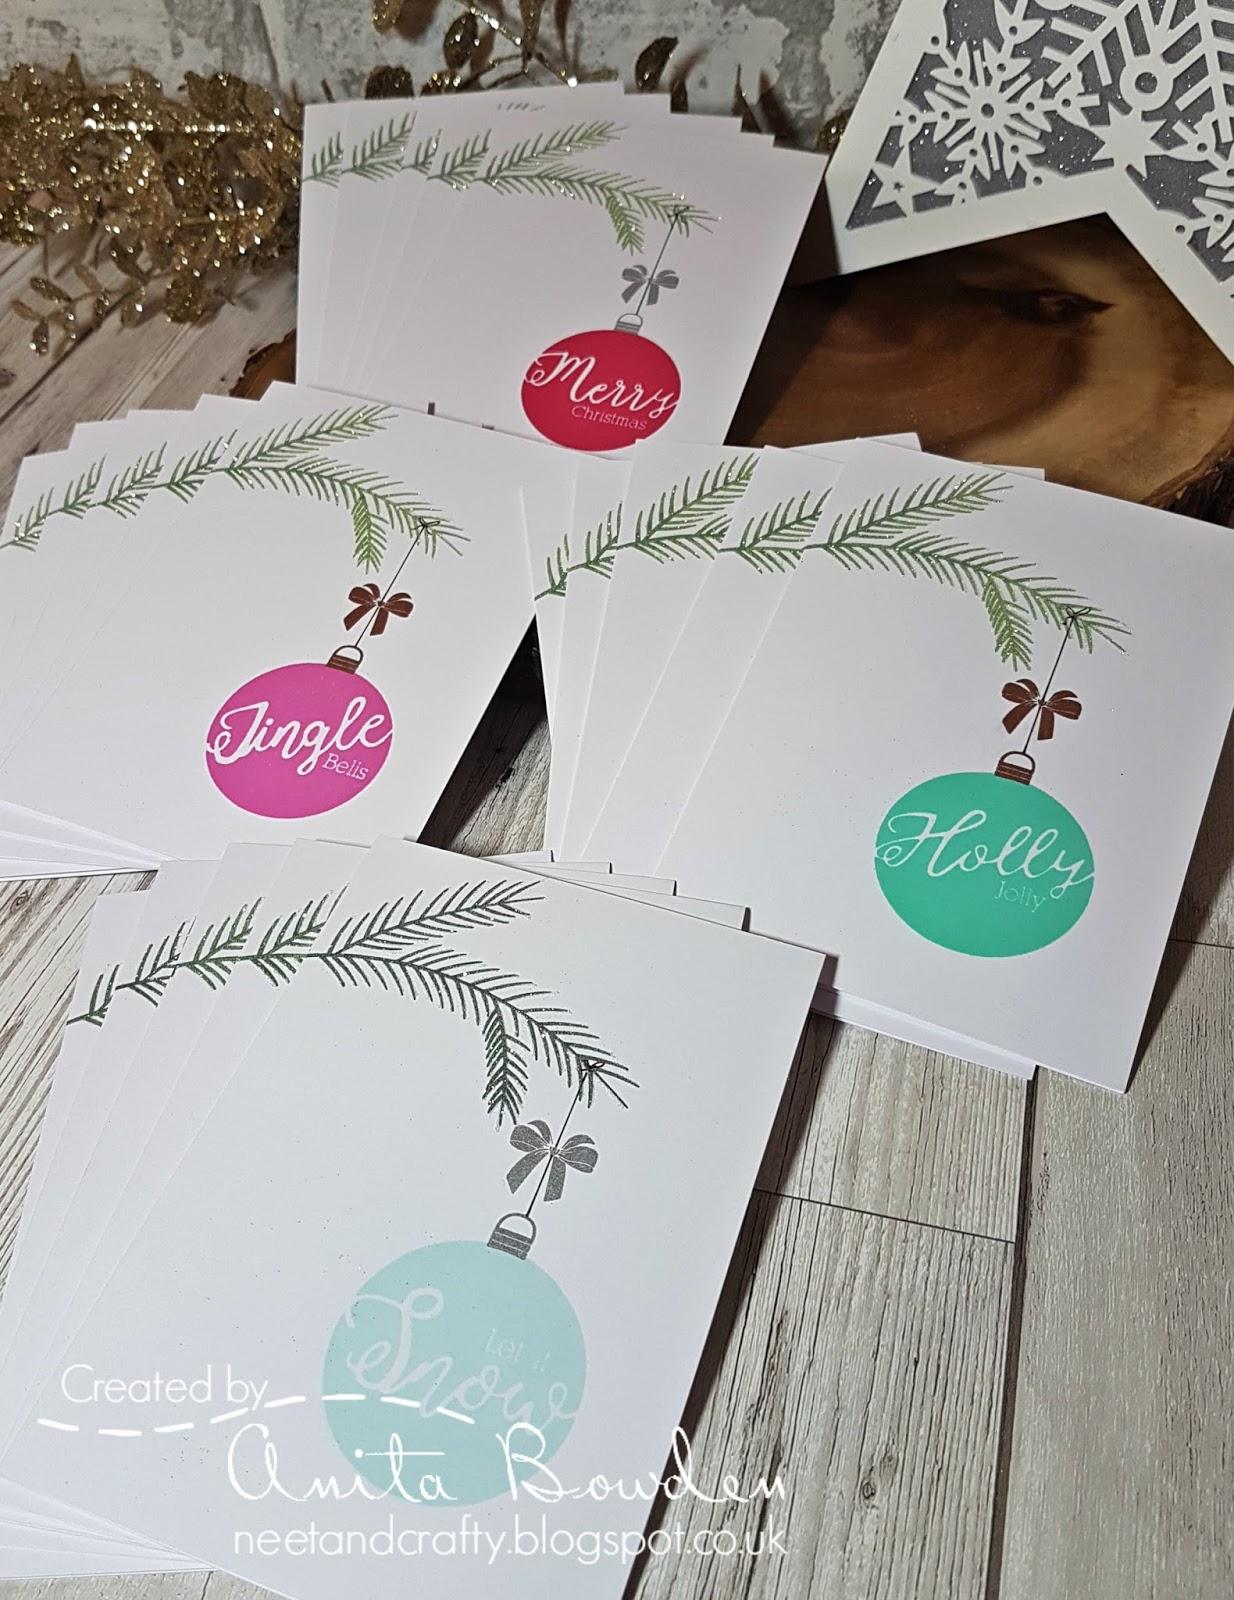 Neet & Crafty: Christmas Card Multiples - Sentiment Baubles